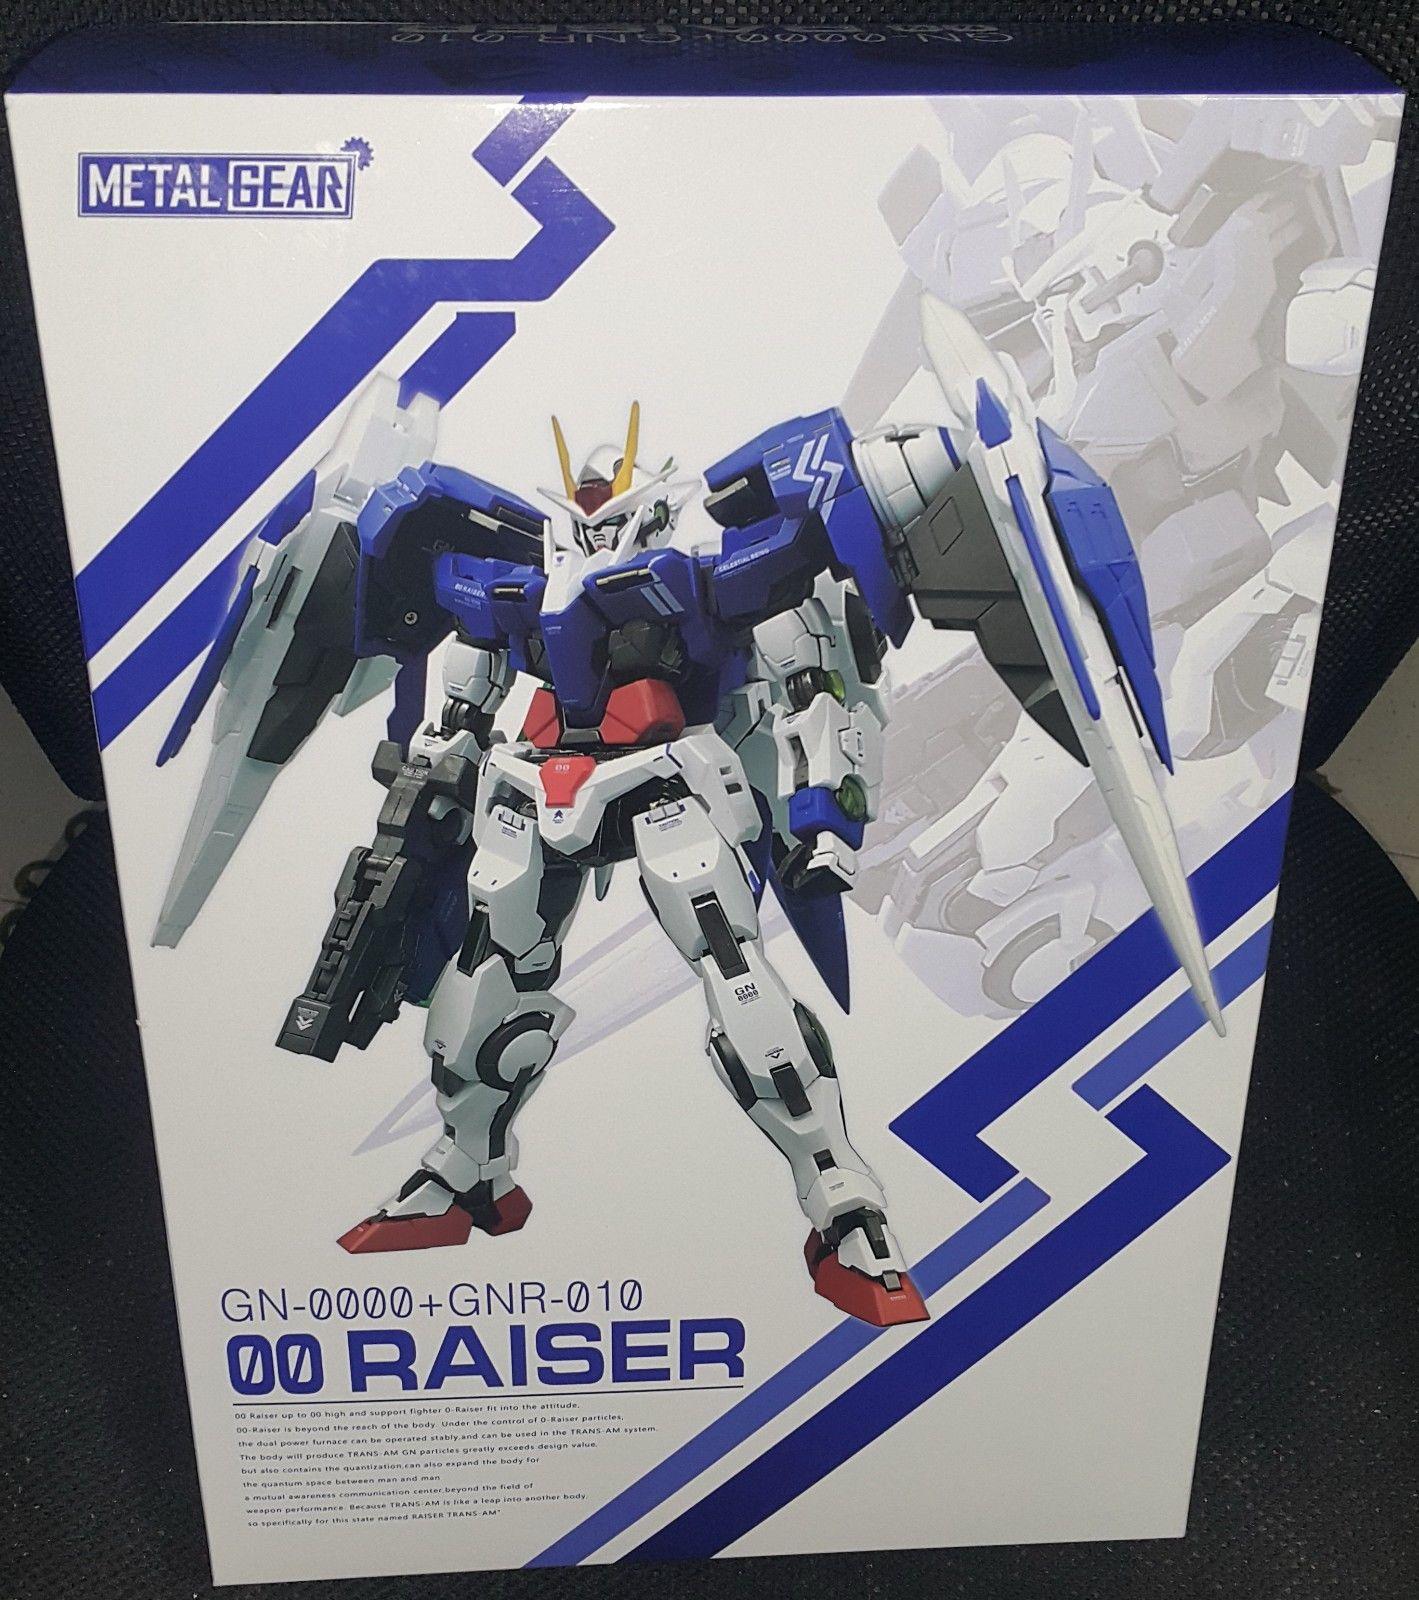 MC Metal Gear Metal build MB 00 Raiser GN-0000 + GNR-010 Gundam